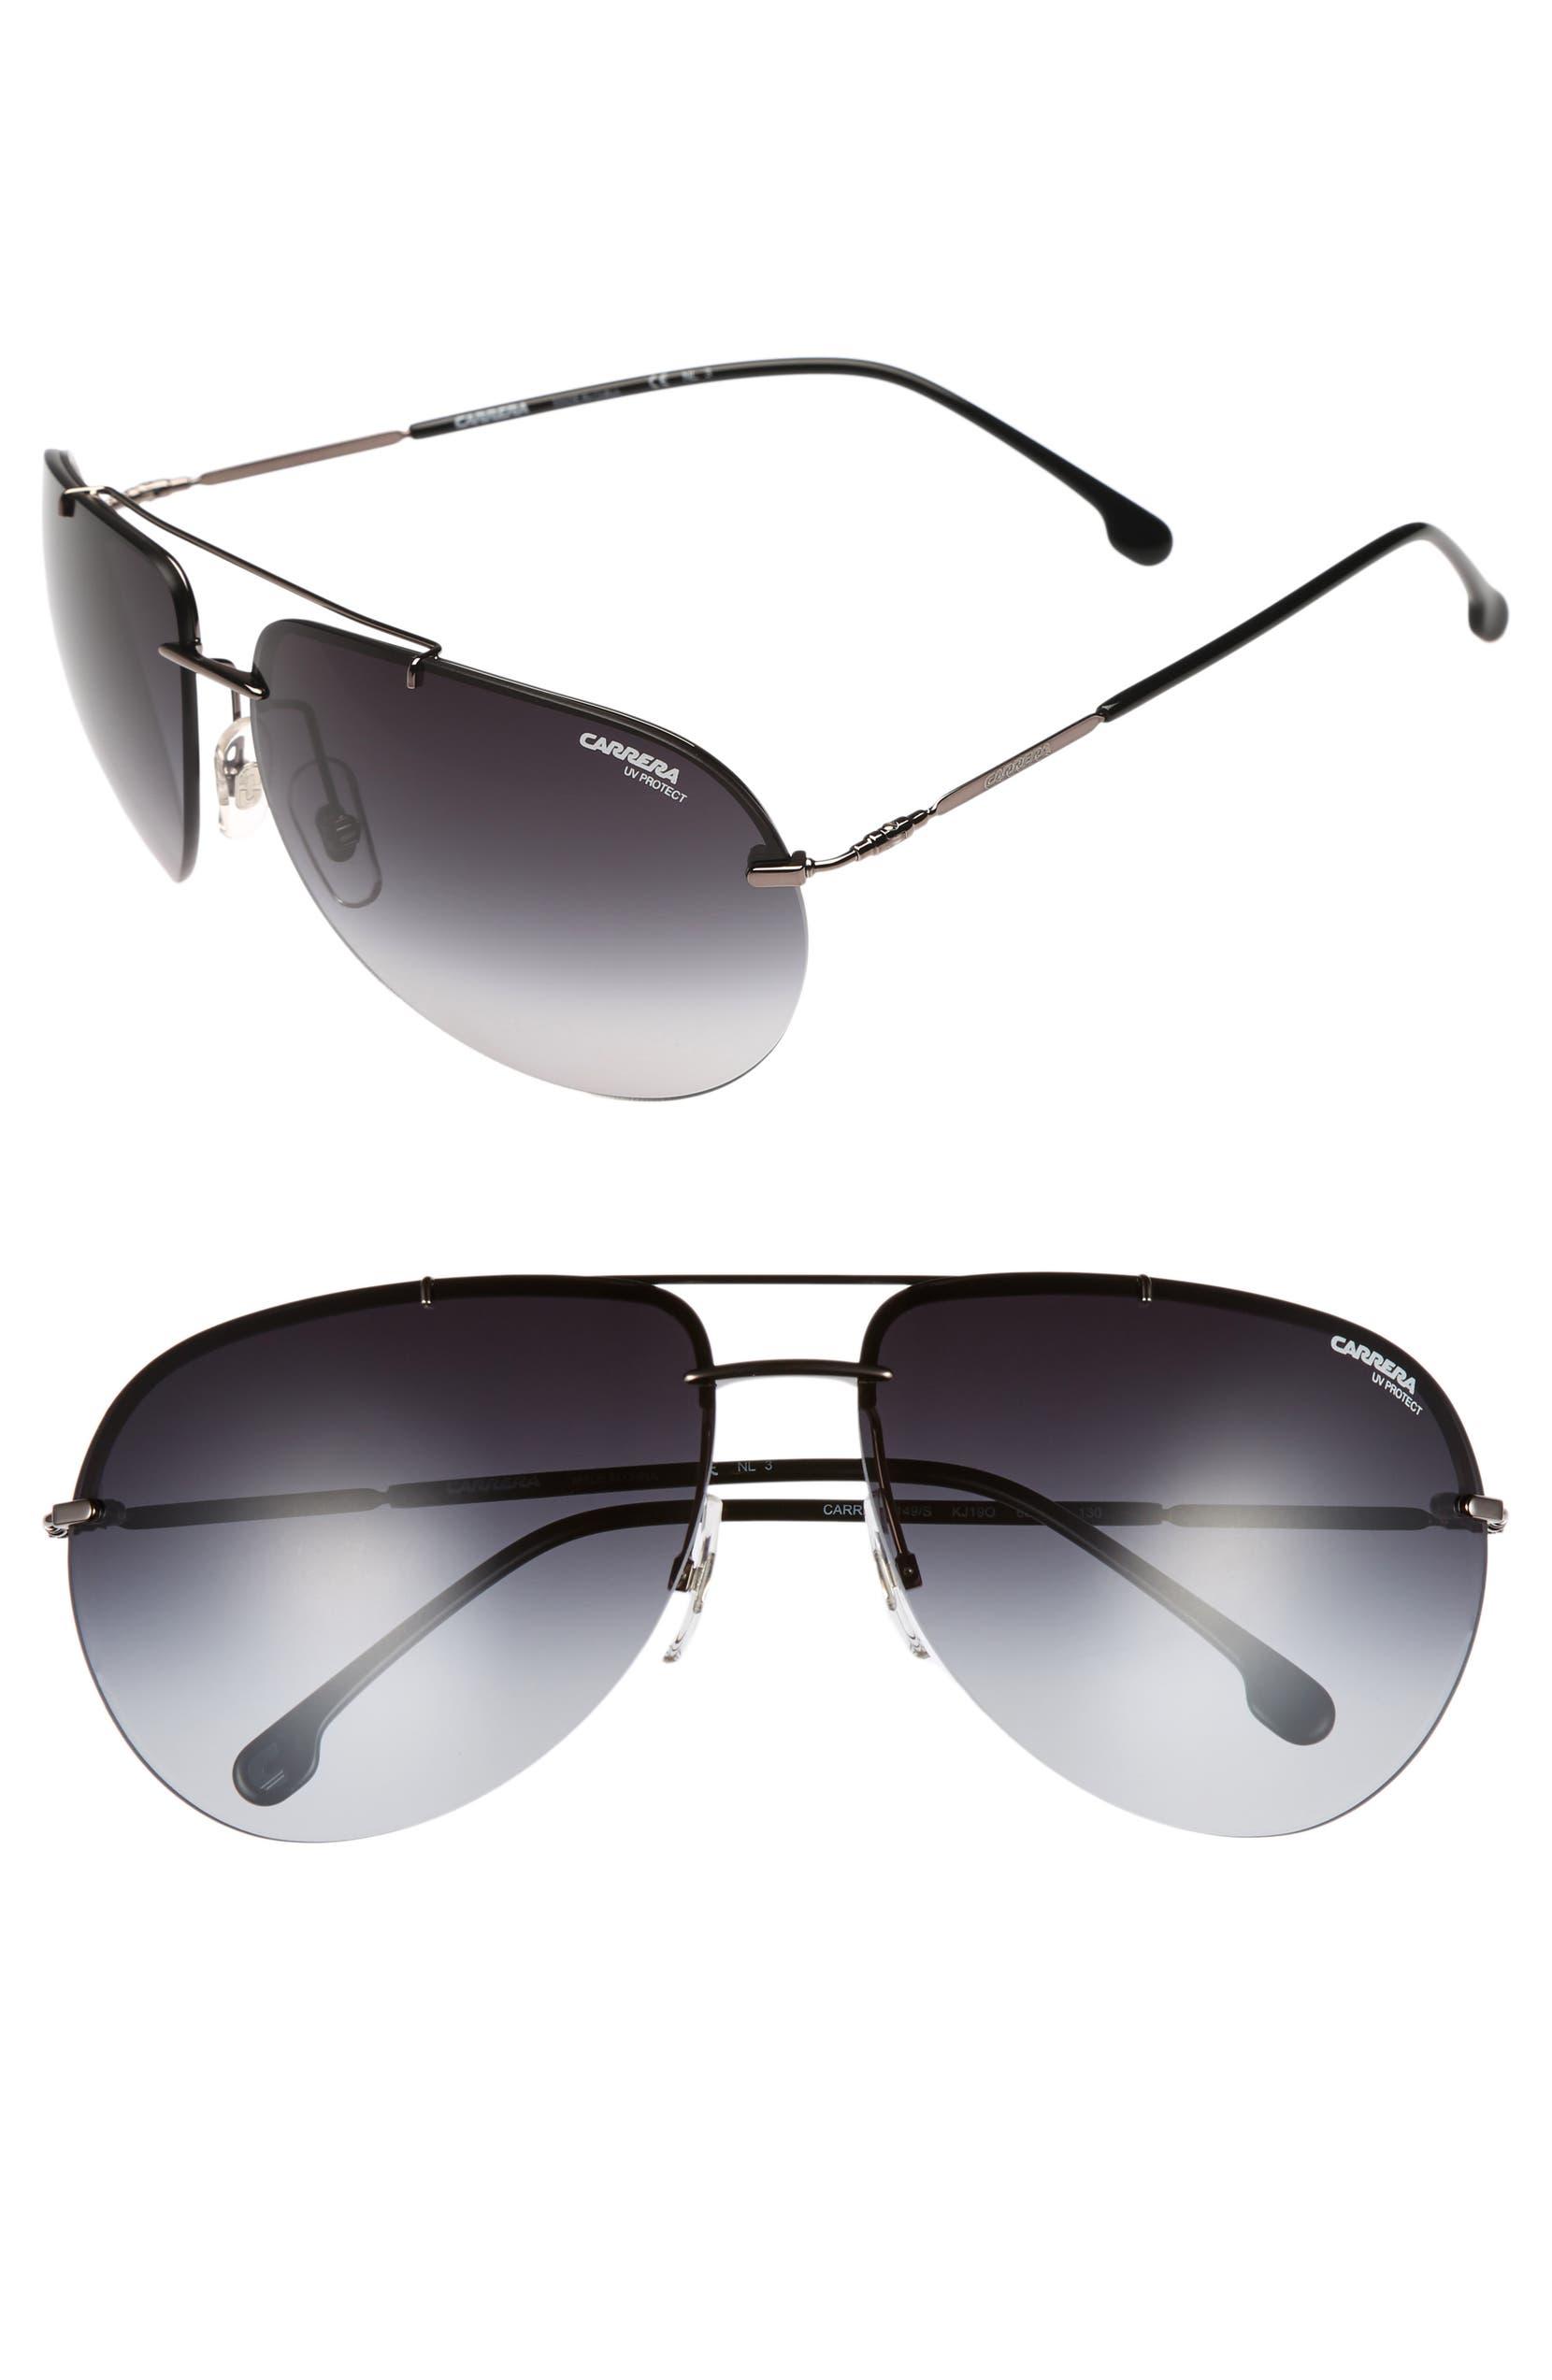 6aaeaa803578e Carrera Eyewear 149S 65mm Polarized Aviator Sunglasses